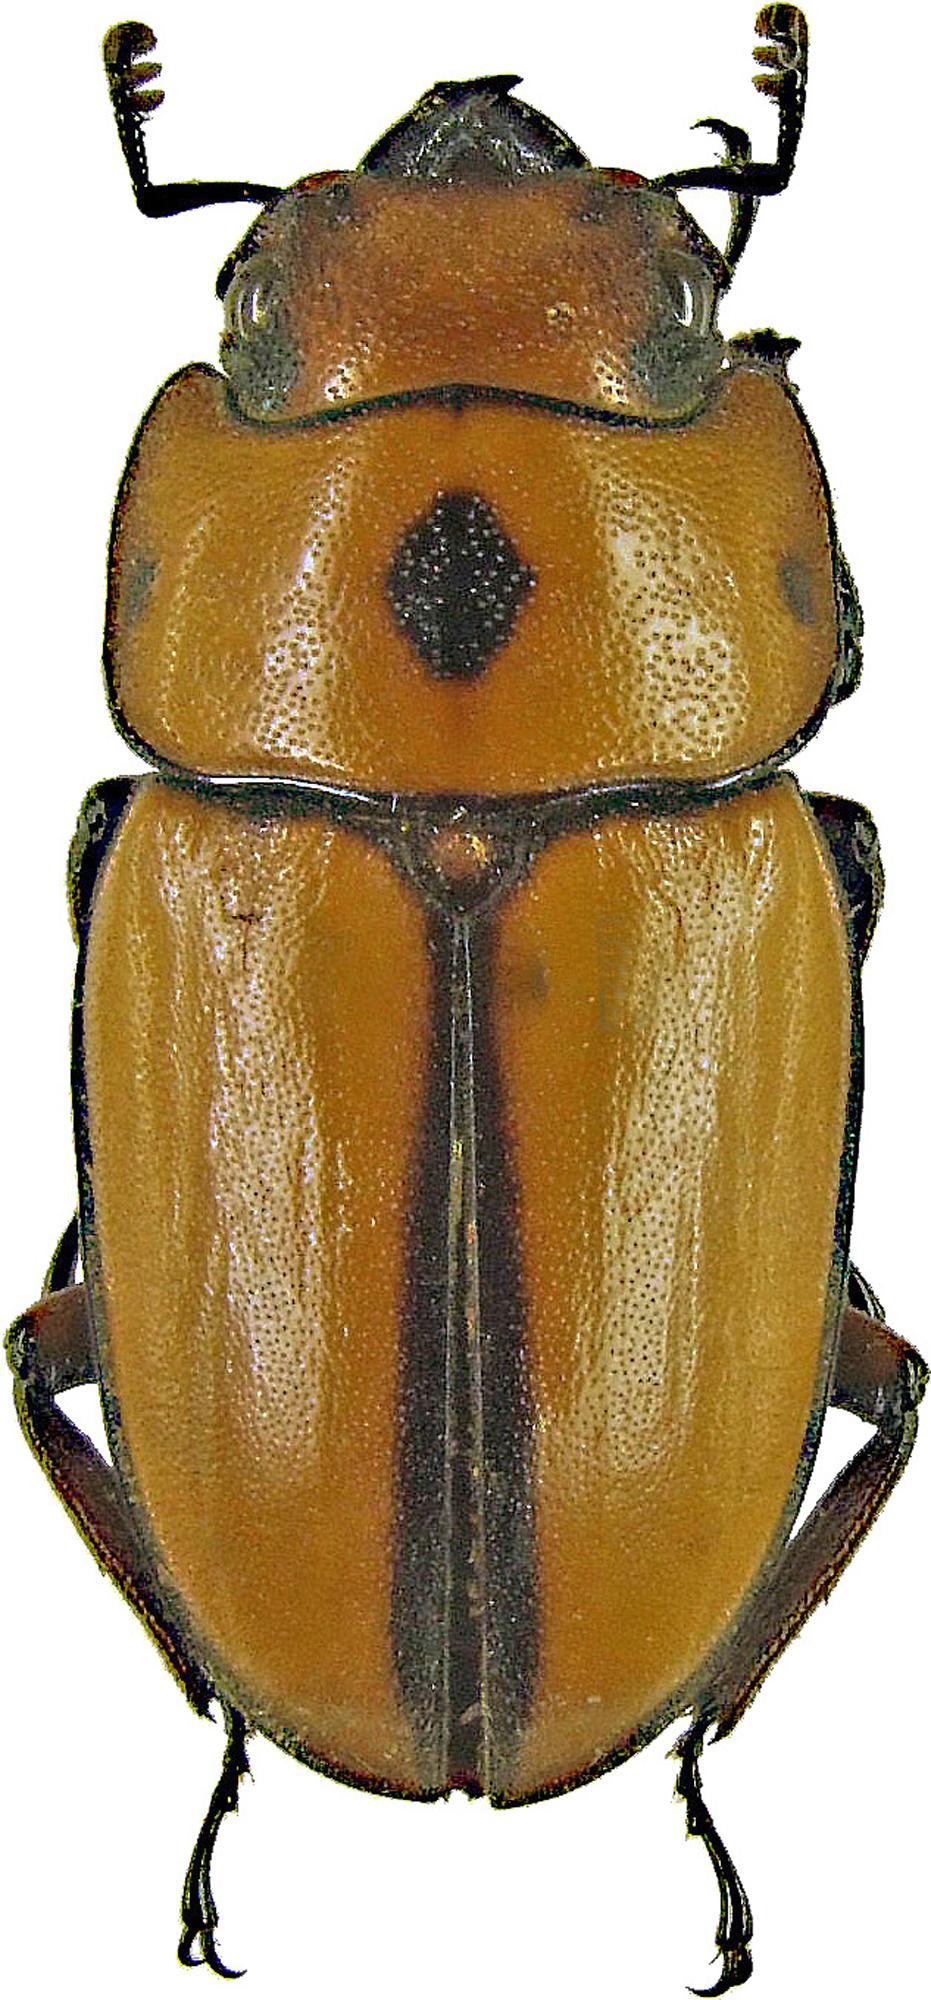 Prosopocoilus (Cyclotropus) occipitalis 1168.jpg